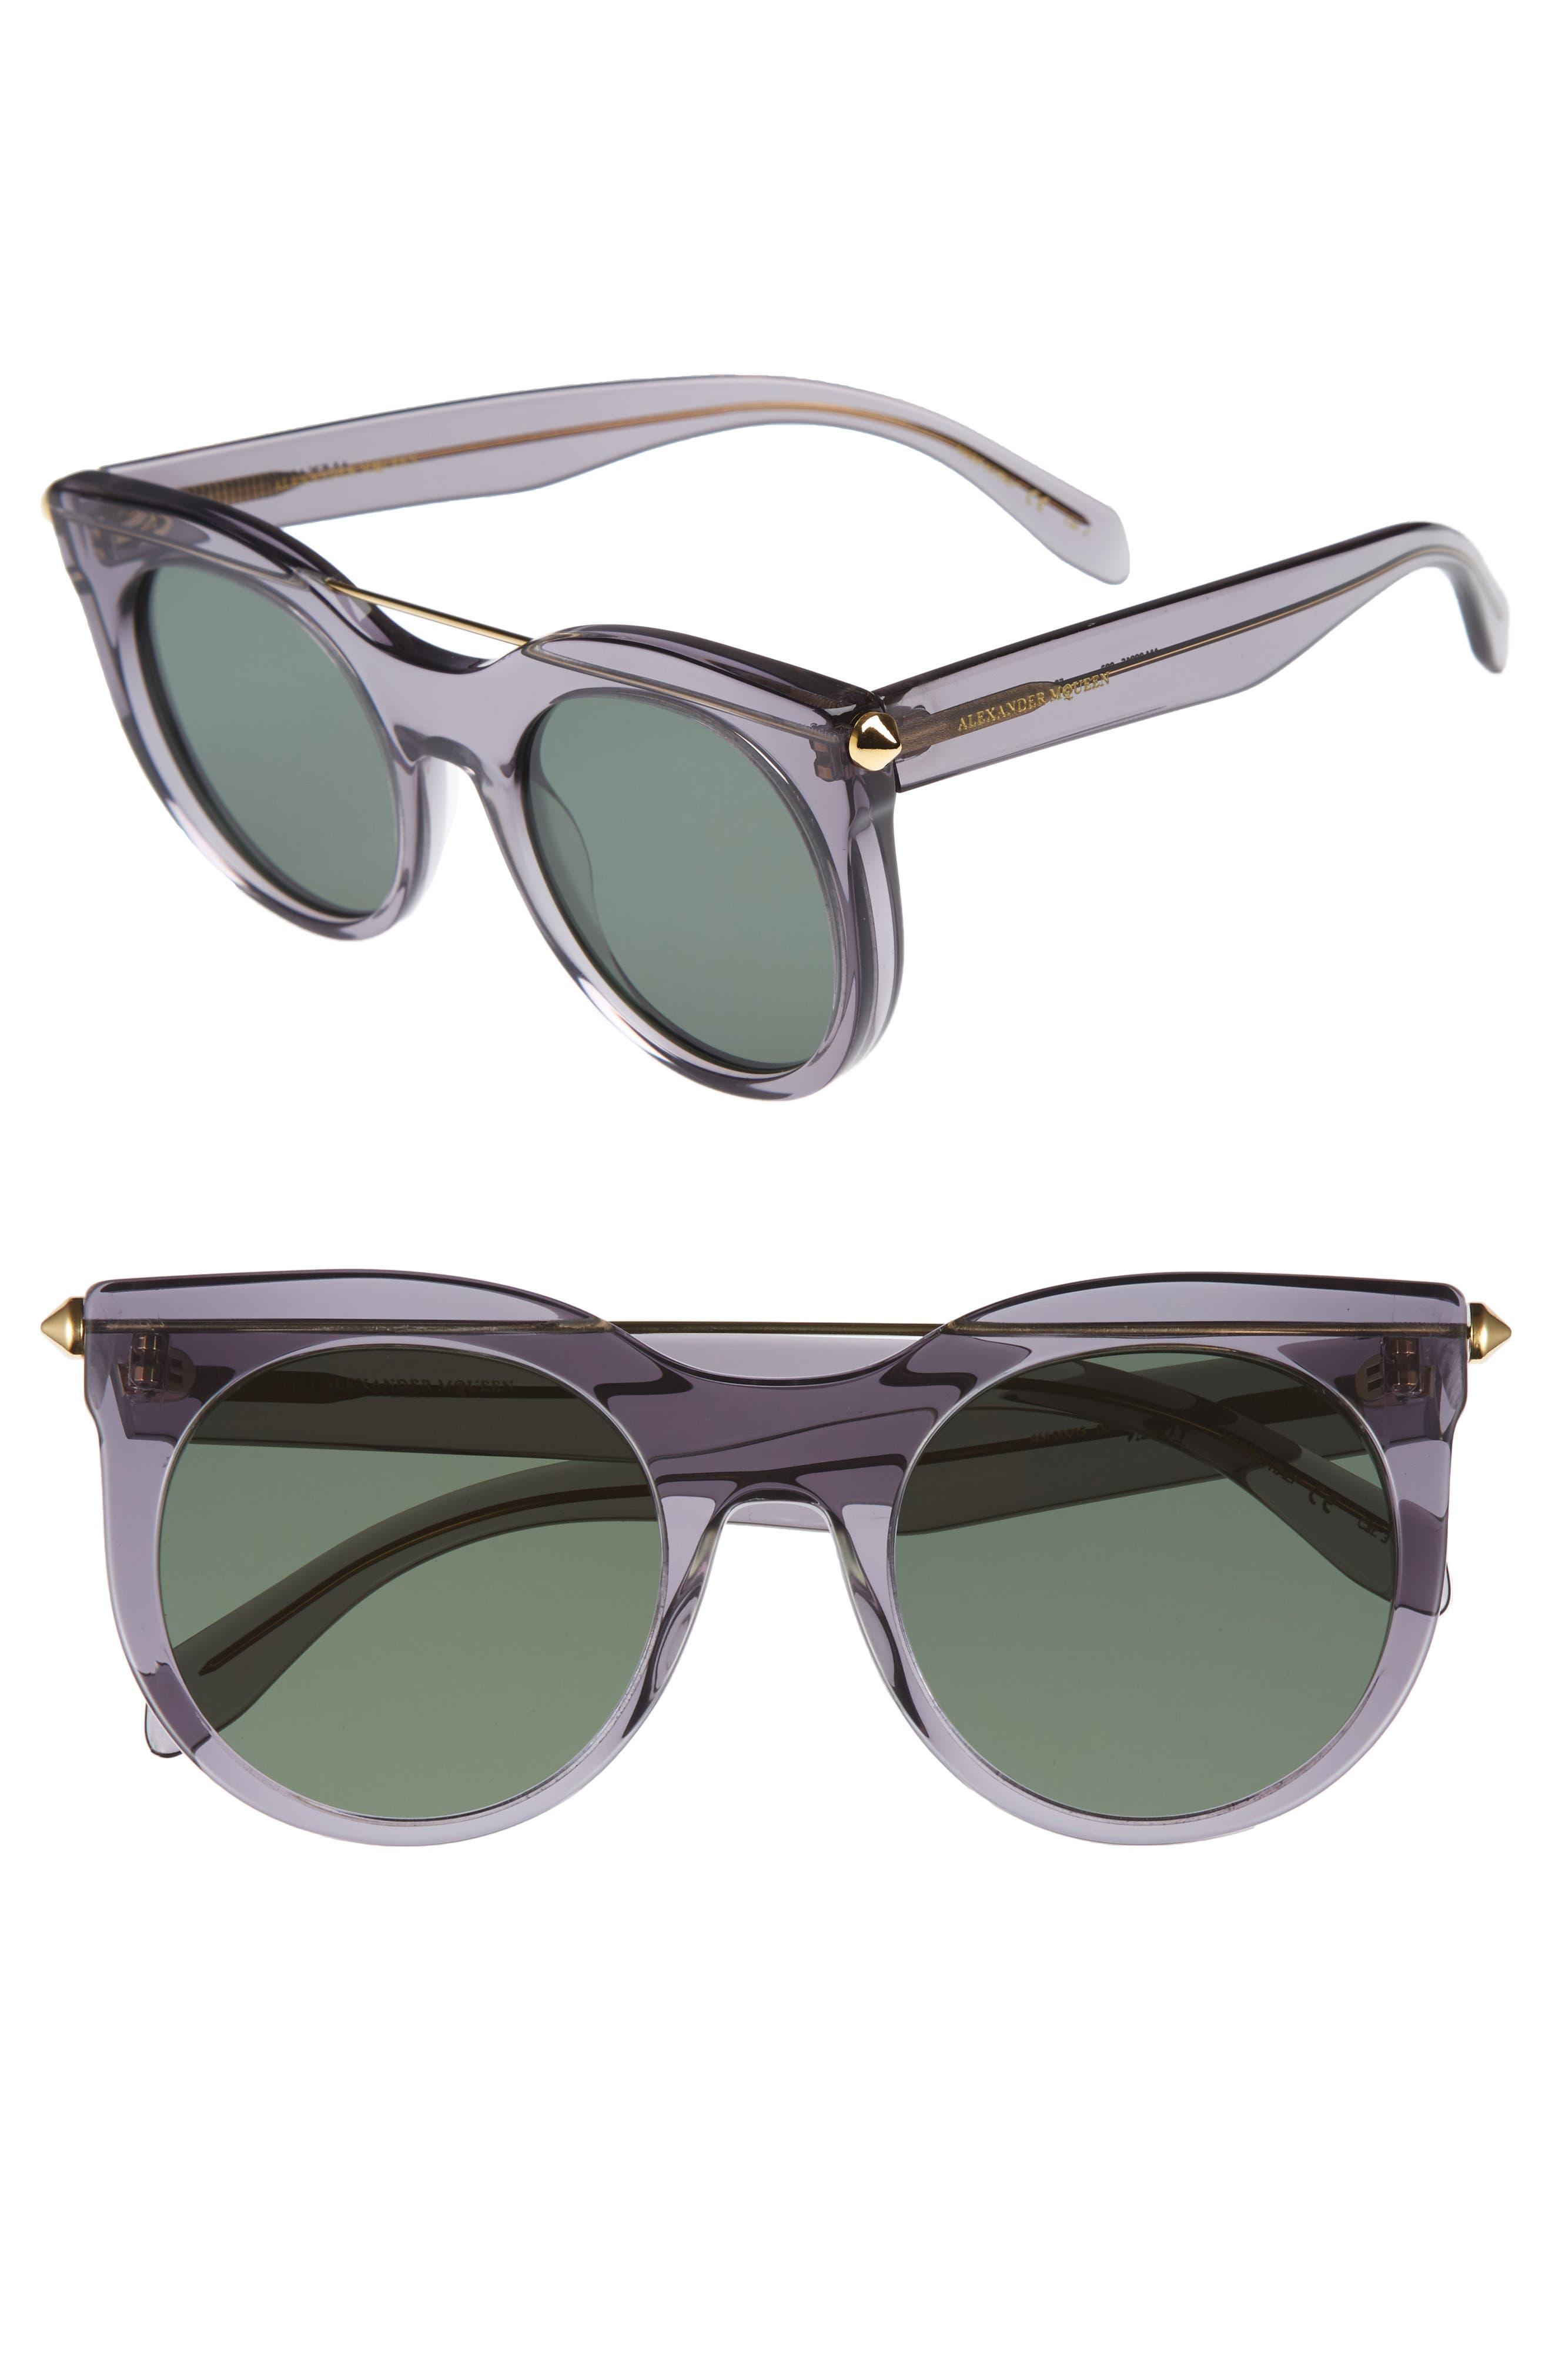 Alexander McQueen 52mm Cat Eye Sunglasses